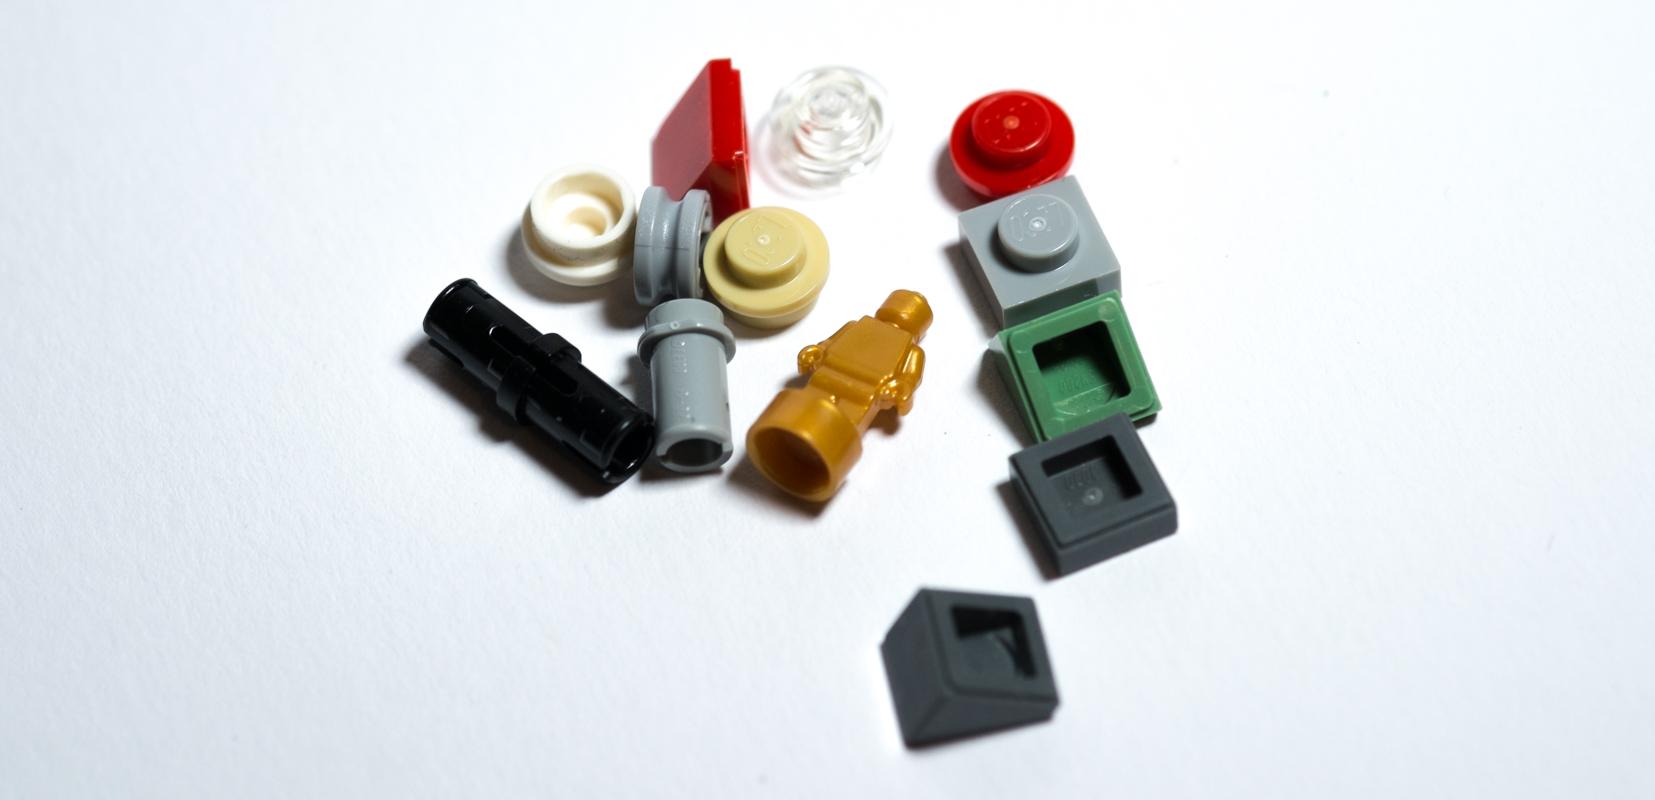 lego berlin architecture set spare parts